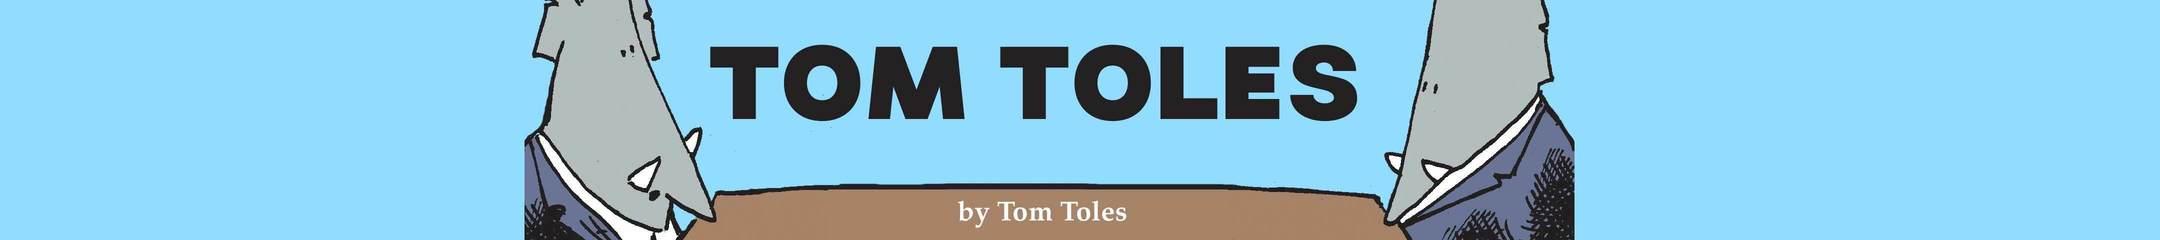 Tom Toles